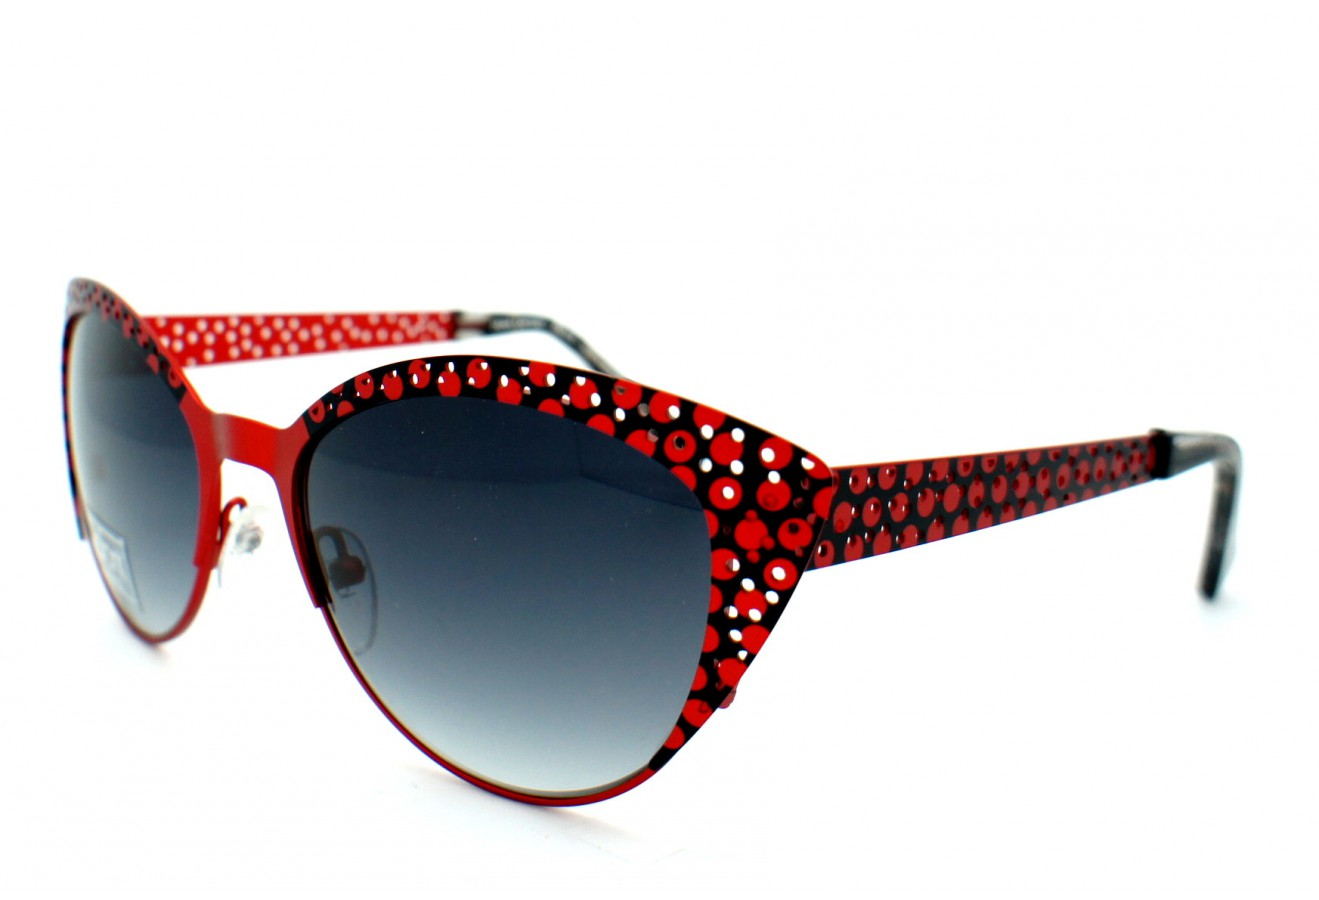 les femmes rouges de lunettes de soleil heju blog deco diy lifestyle. Black Bedroom Furniture Sets. Home Design Ideas